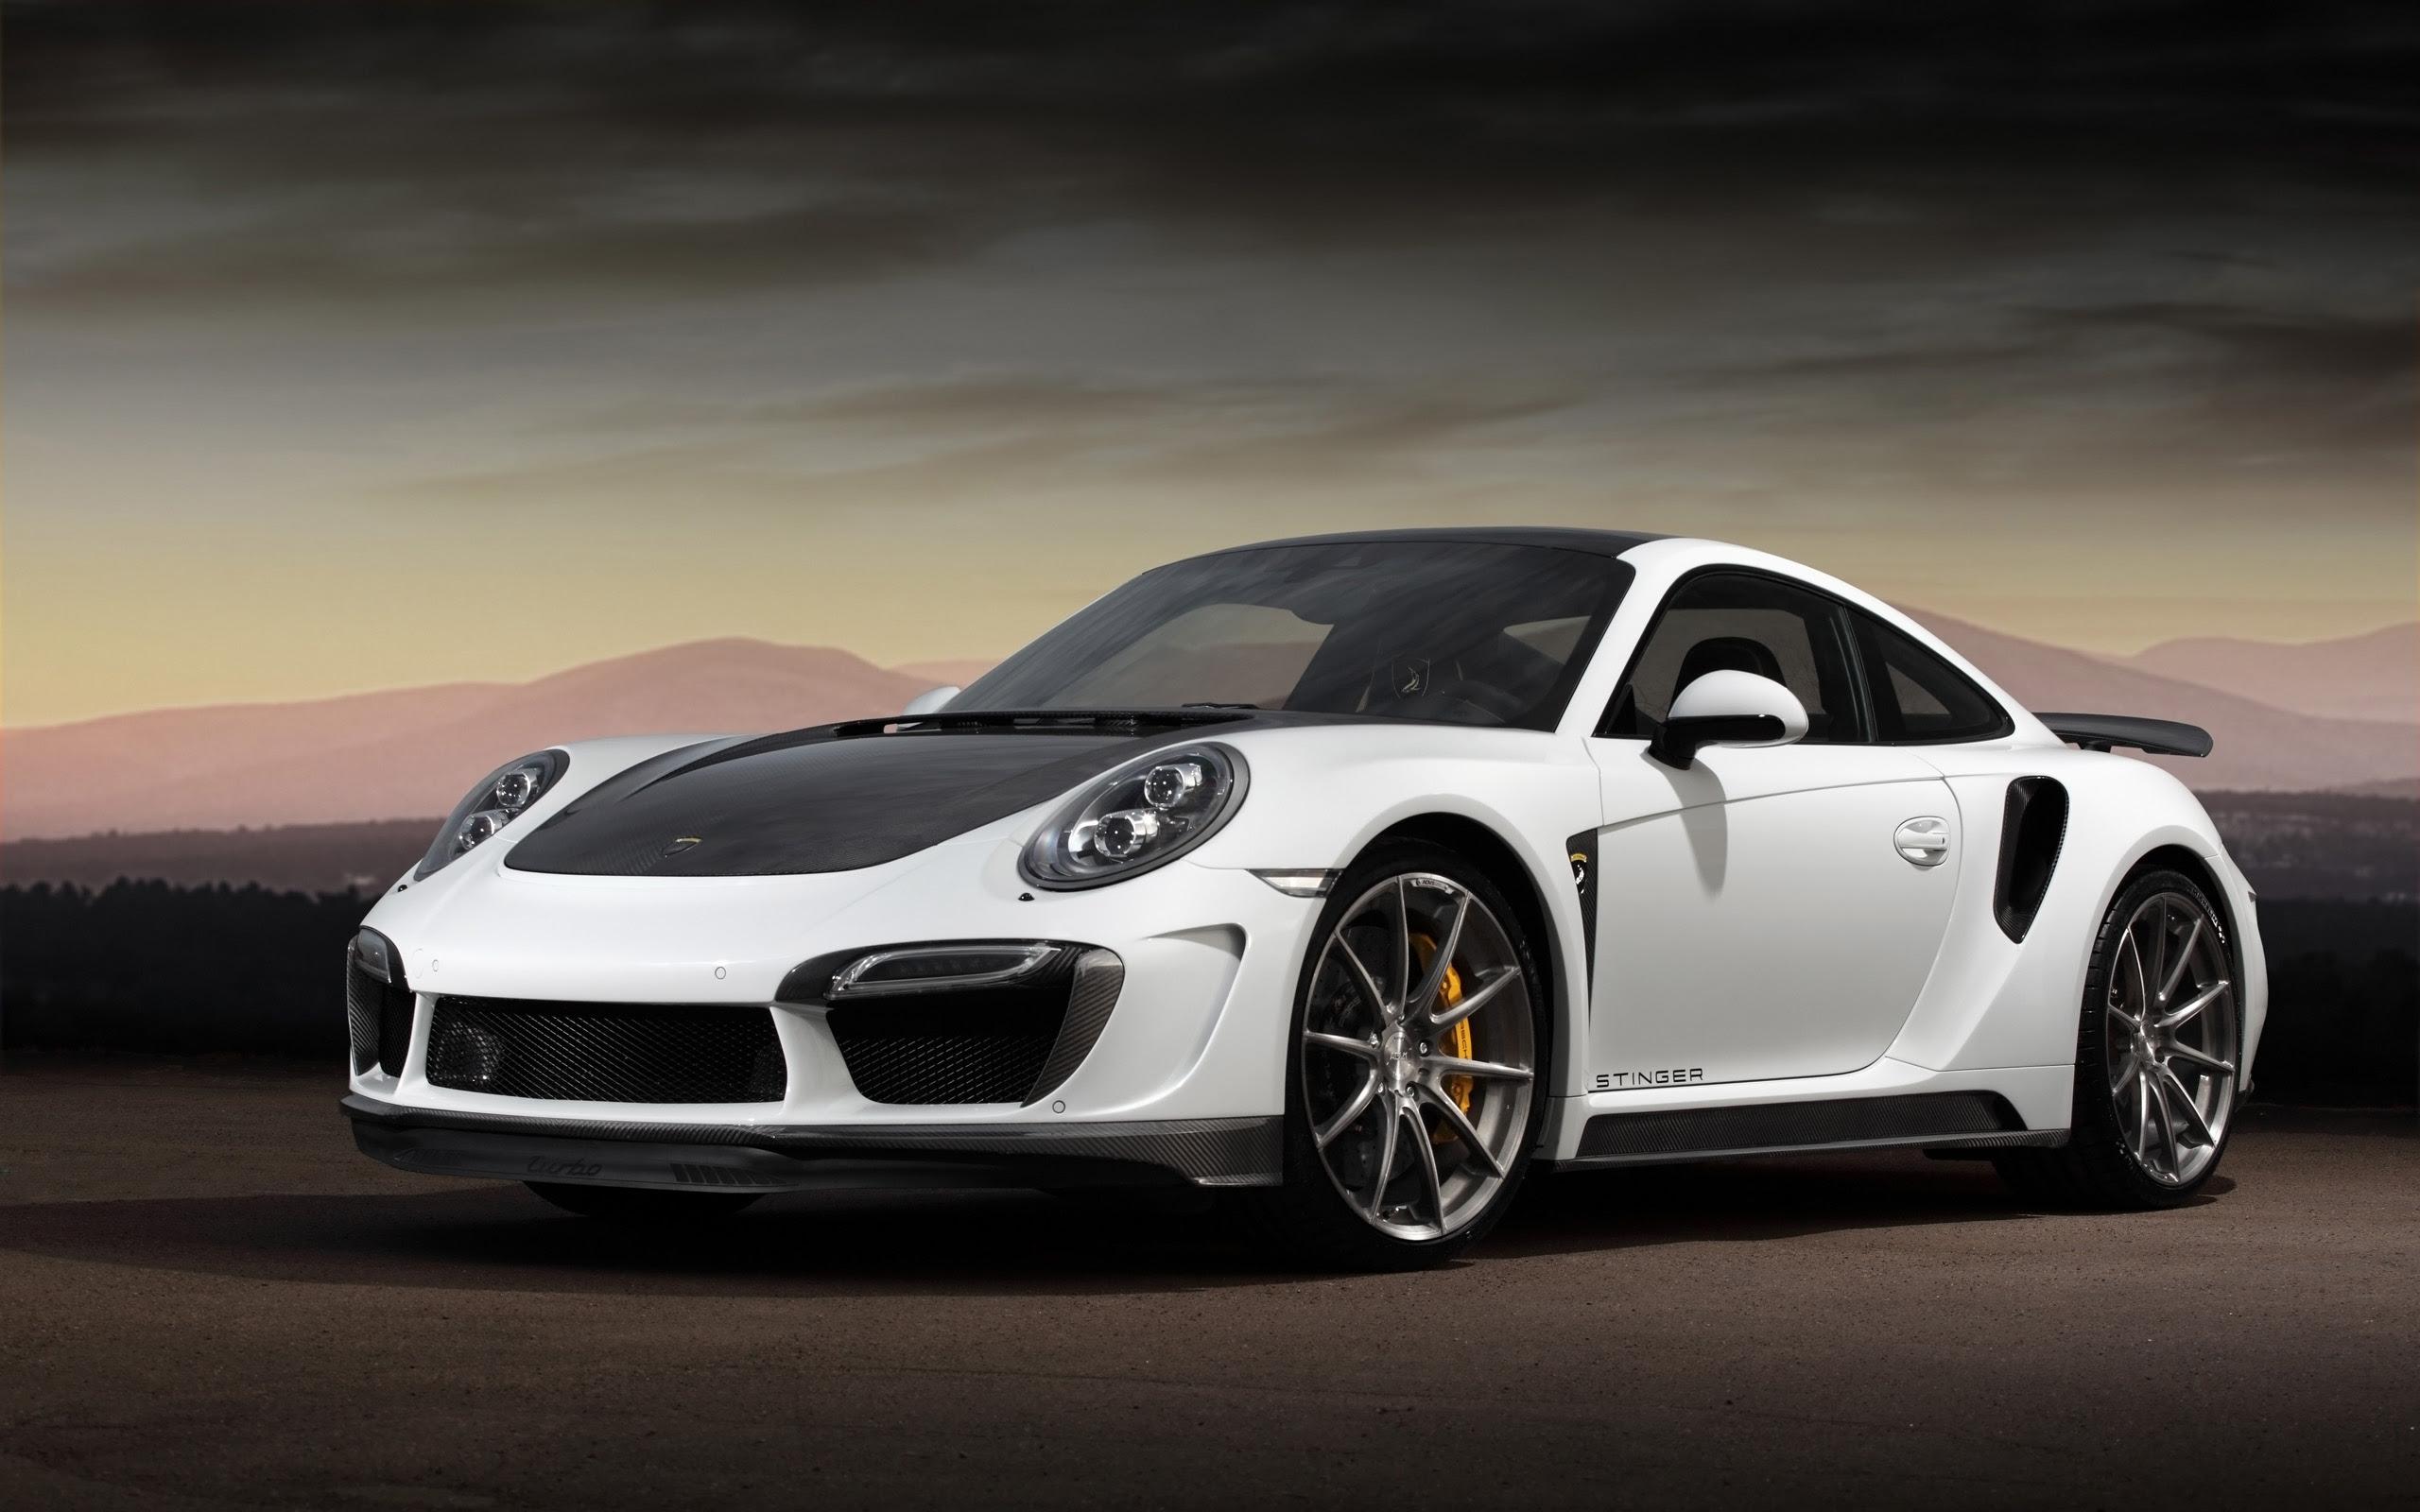 2015 TopCar Porsche 991 Turbo Stinger GTR Wallpaper   HD ...